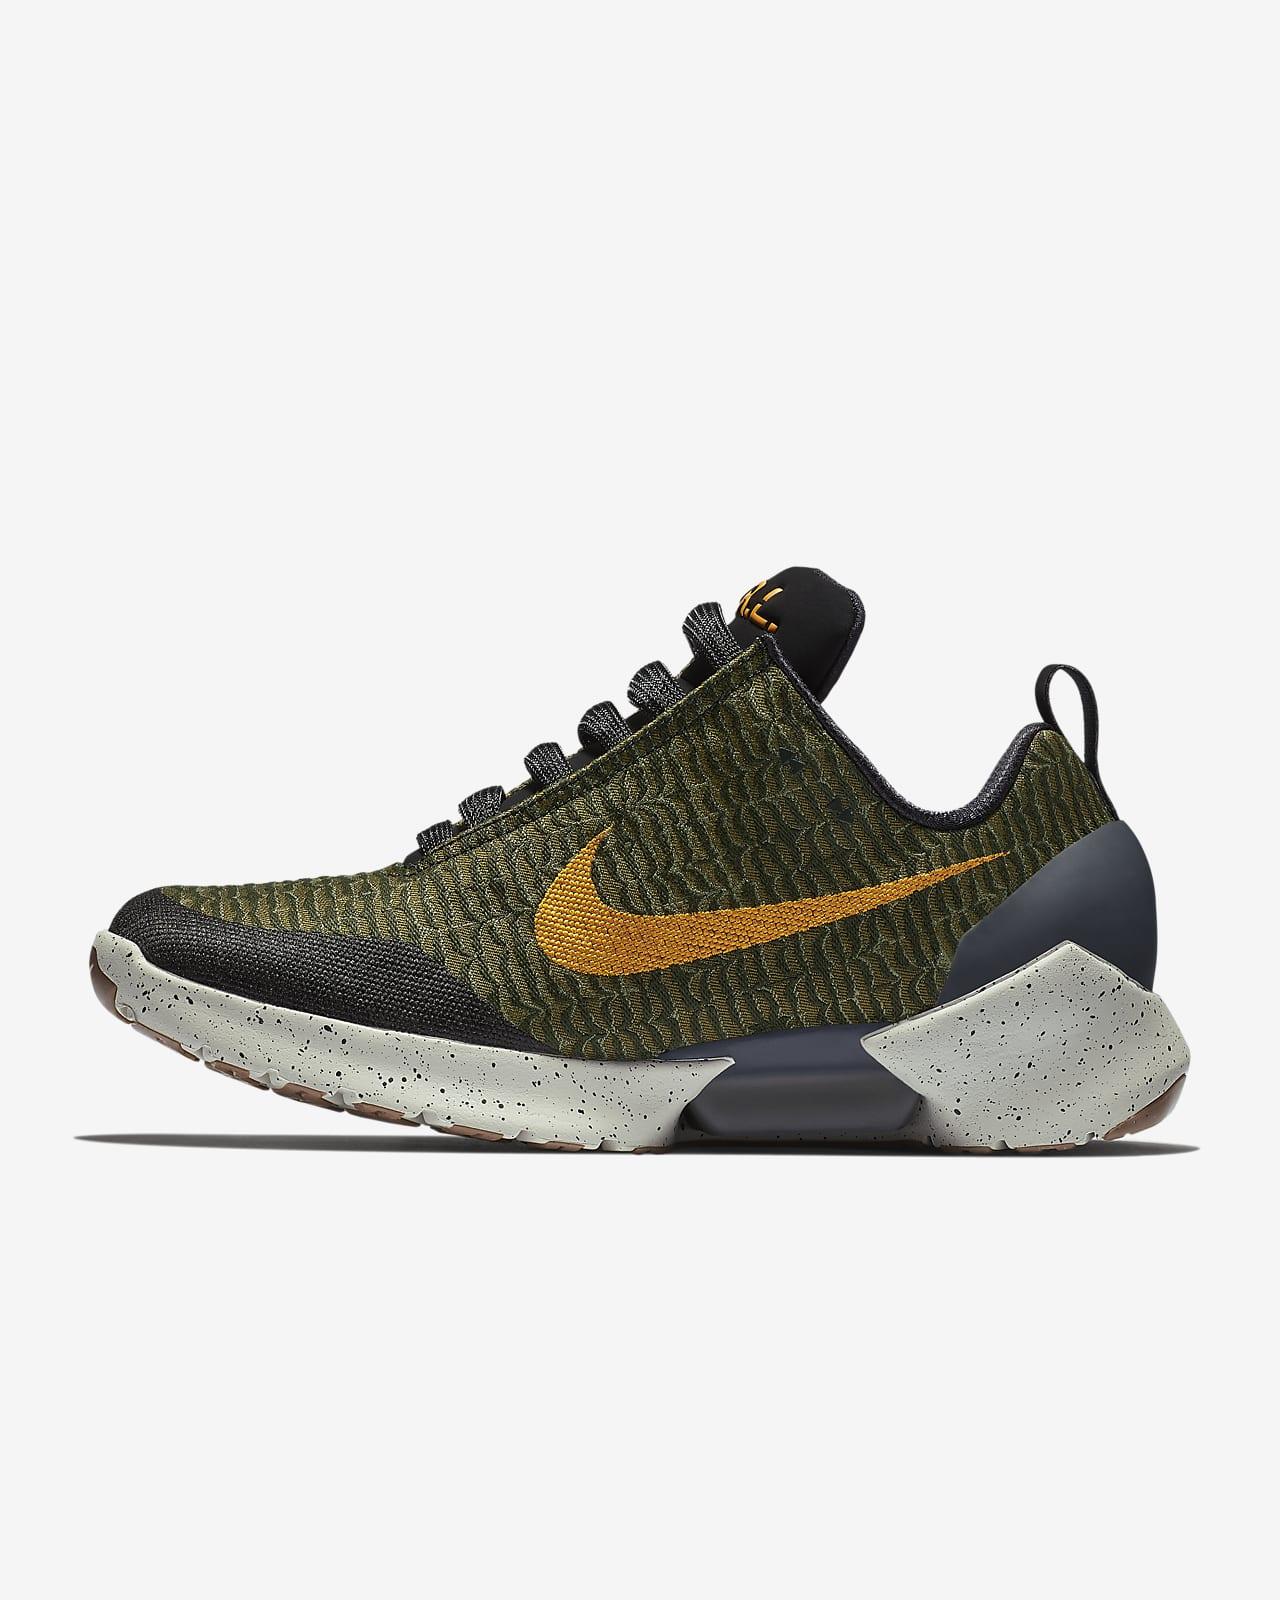 Nike HyperAdapt 1.0 (UK Plug) Men's Shoe